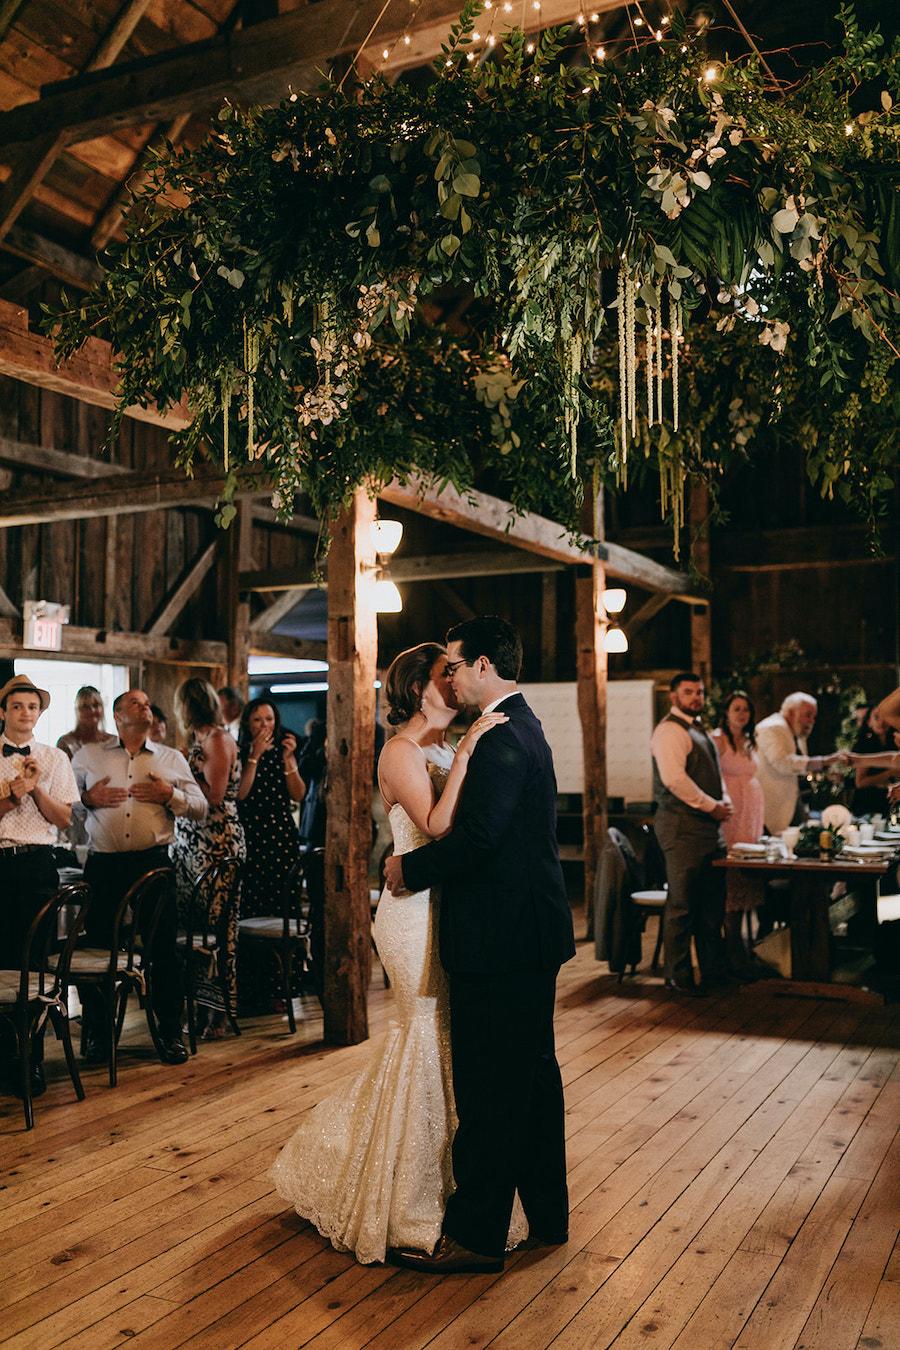 newlywed first dance under custom chandelier